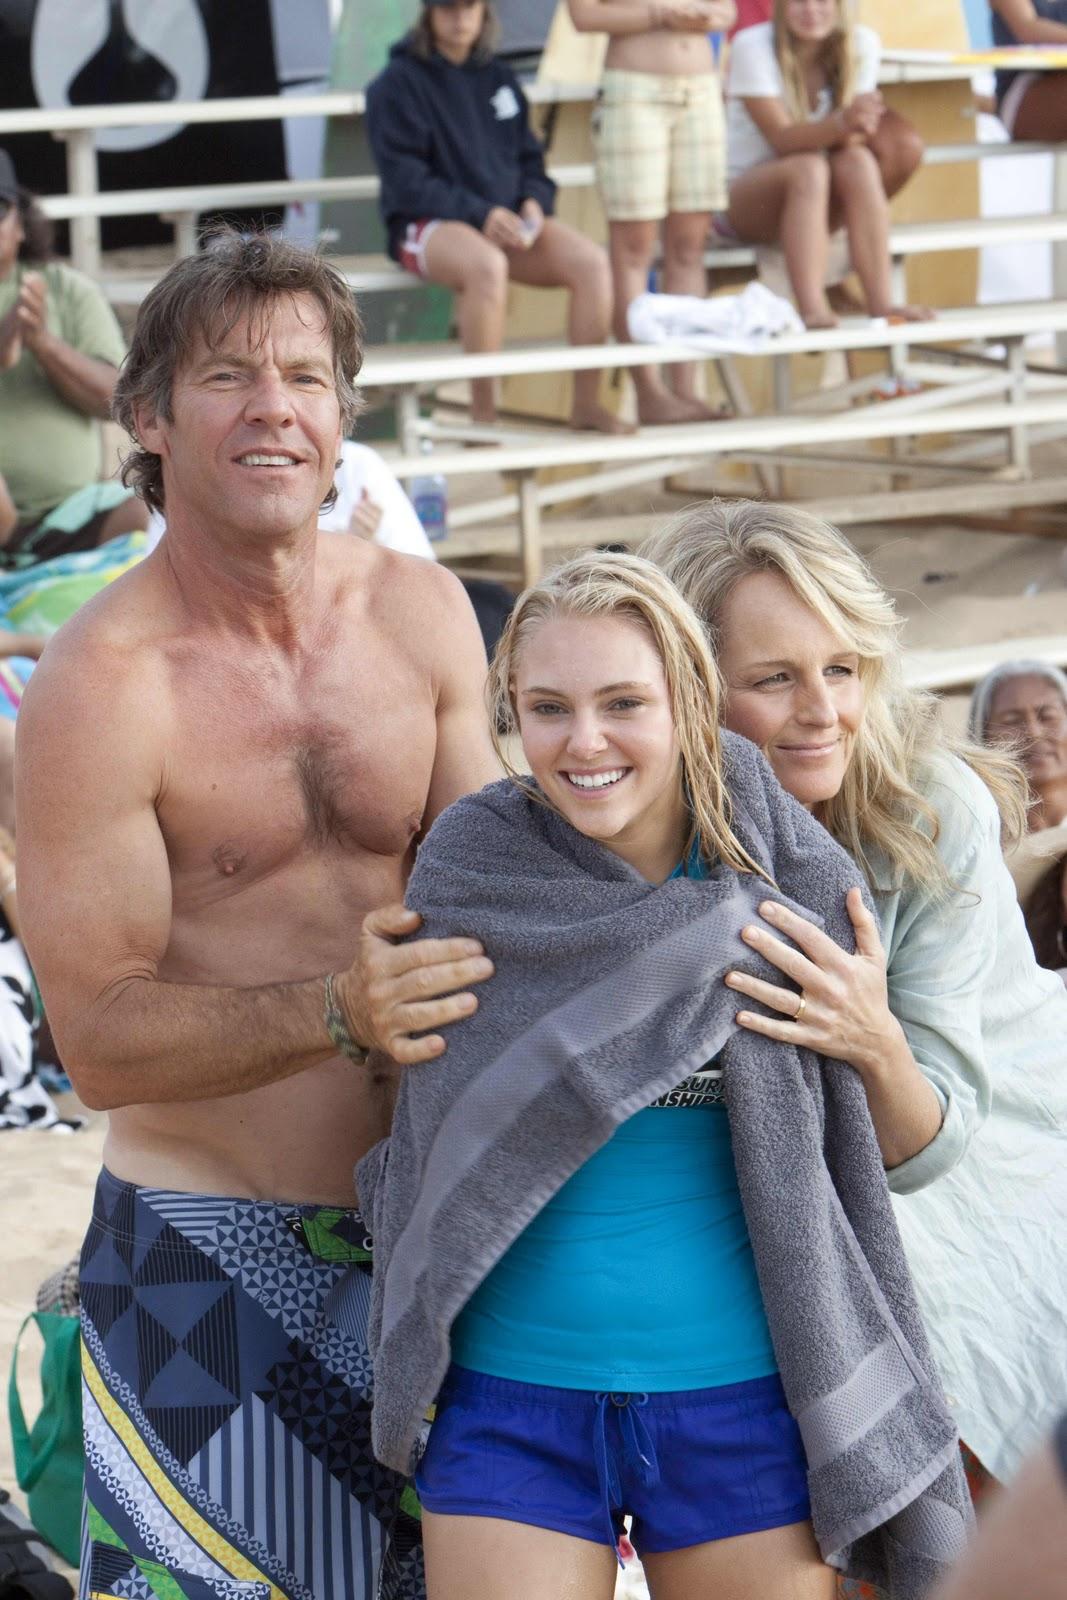 http://4.bp.blogspot.com/_ySF0-nxfikU/TR7JywYMqhI/AAAAAAAAAnE/a7Z8WUGL8rA/s1600/soul_surfer_movie_image_dennis_quaid_annasophia_robb_helen_hunt_01.jpg